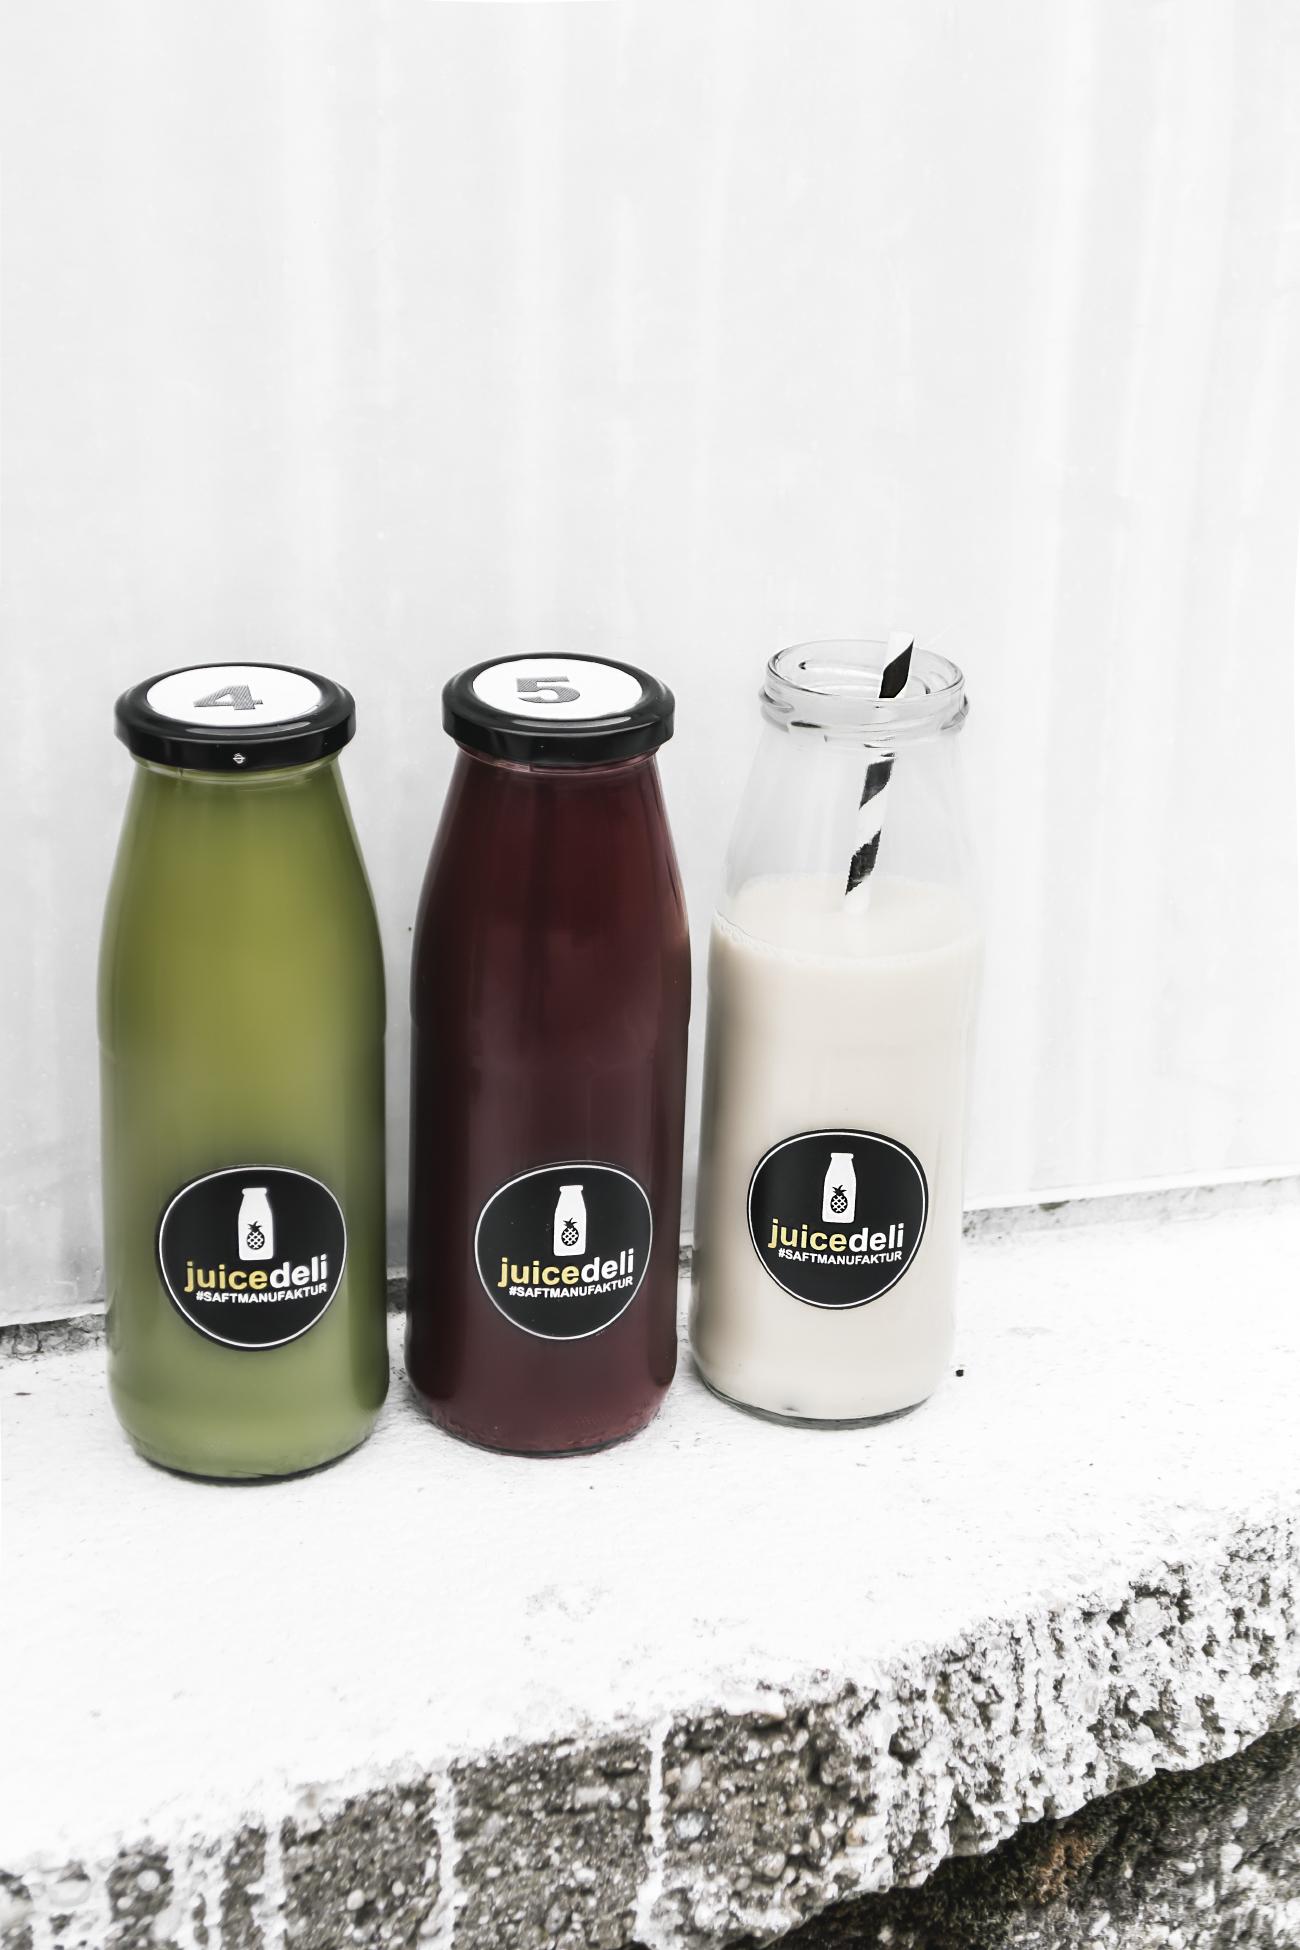 JuiceDeli Detox Säfte - Grüner Juice - Rote Beete Juice - Nussmilch @fleurdemode